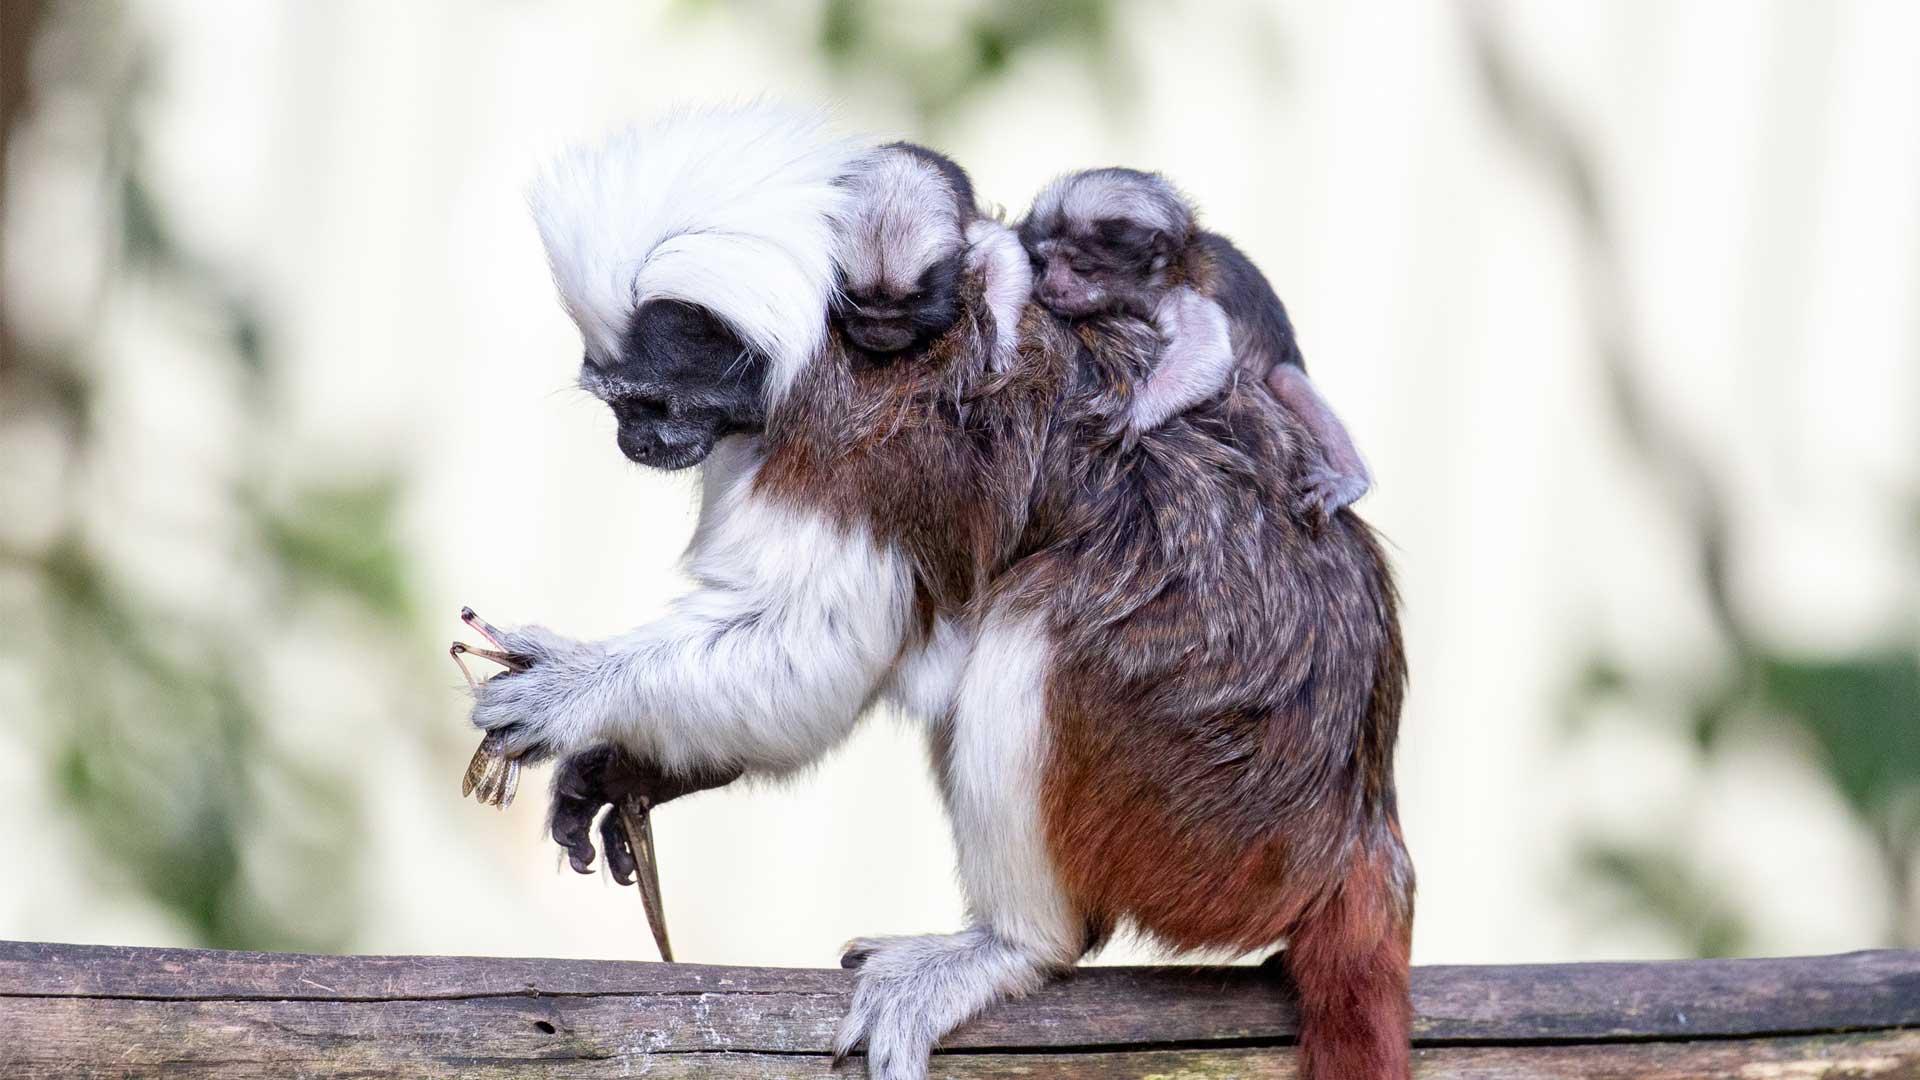 https://rfacdn.nz/zoo/assets/media/cotton-top-babies-gallery-5.jpg